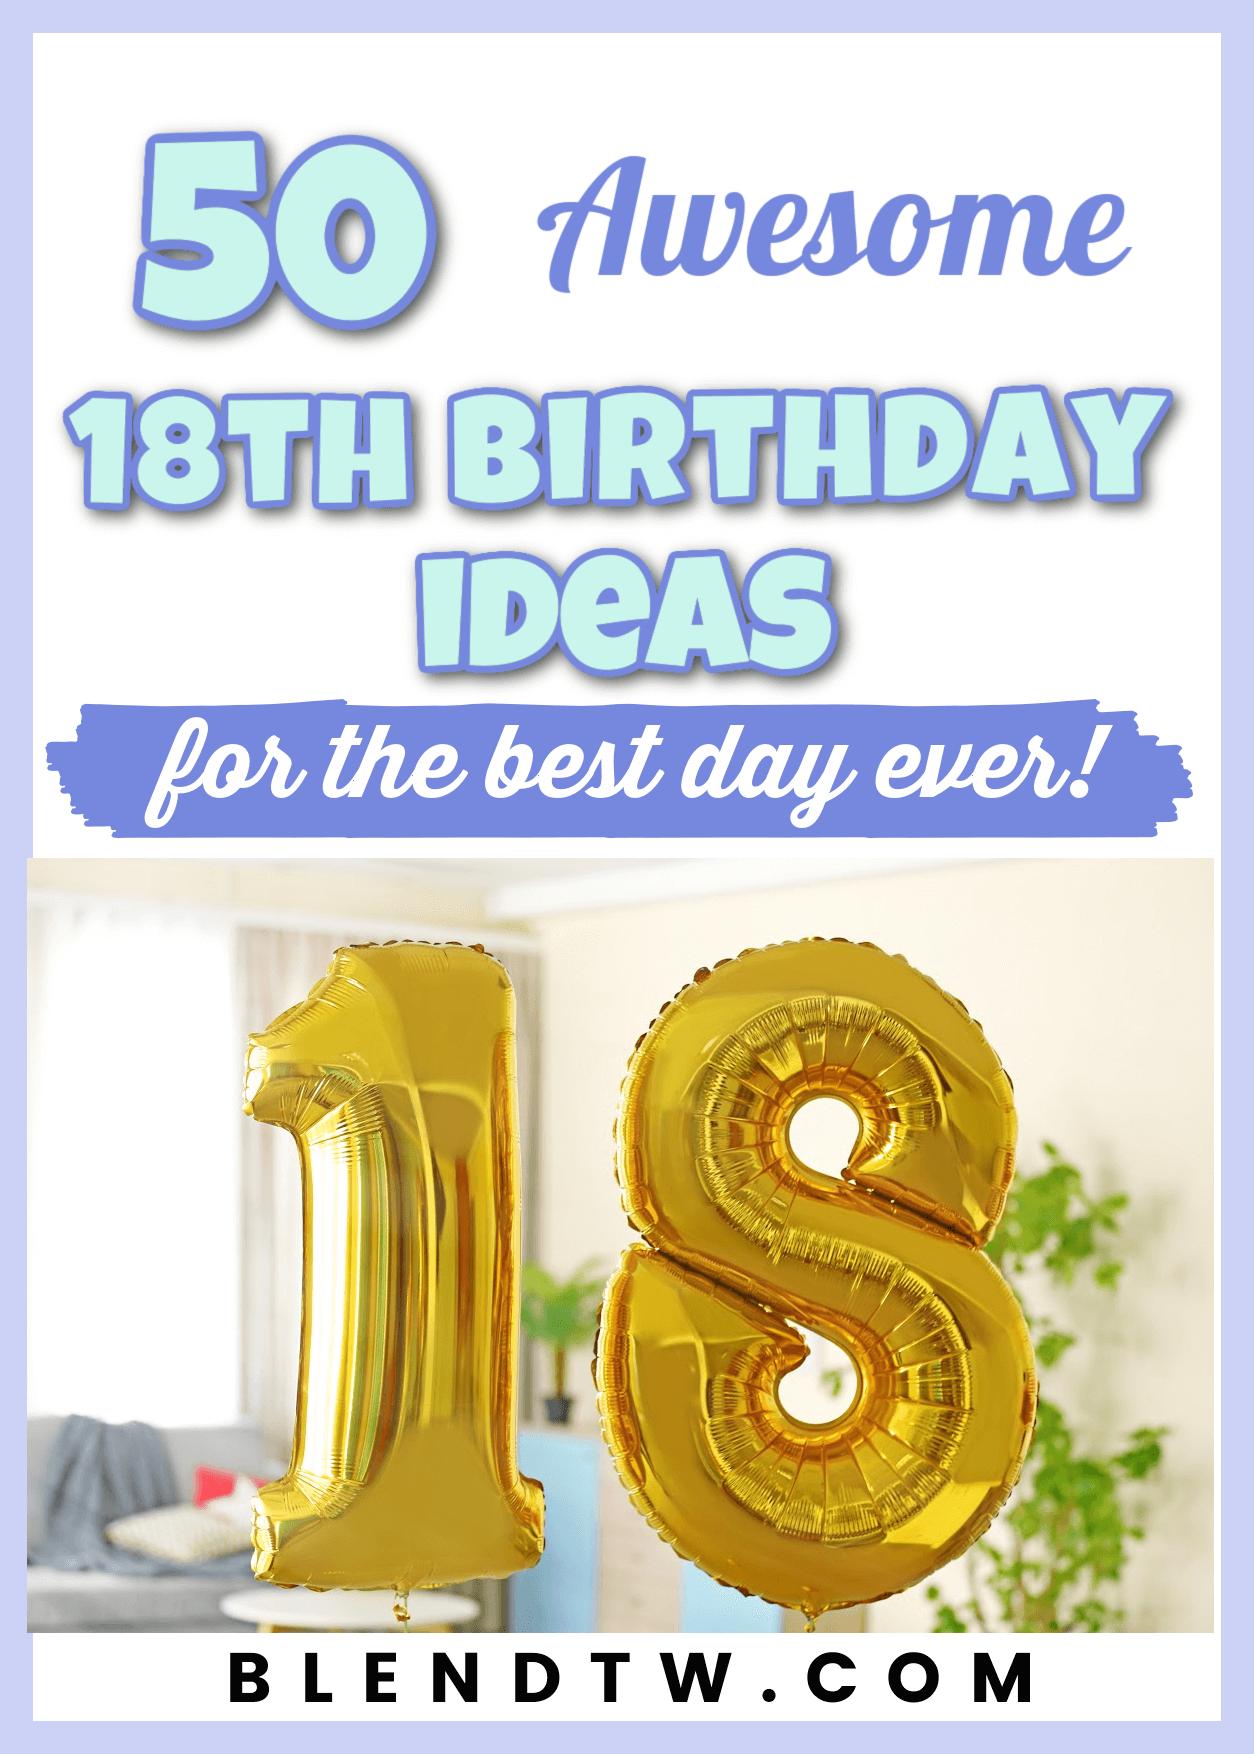 Pin for 50 fantastic 18th birthday ideas.